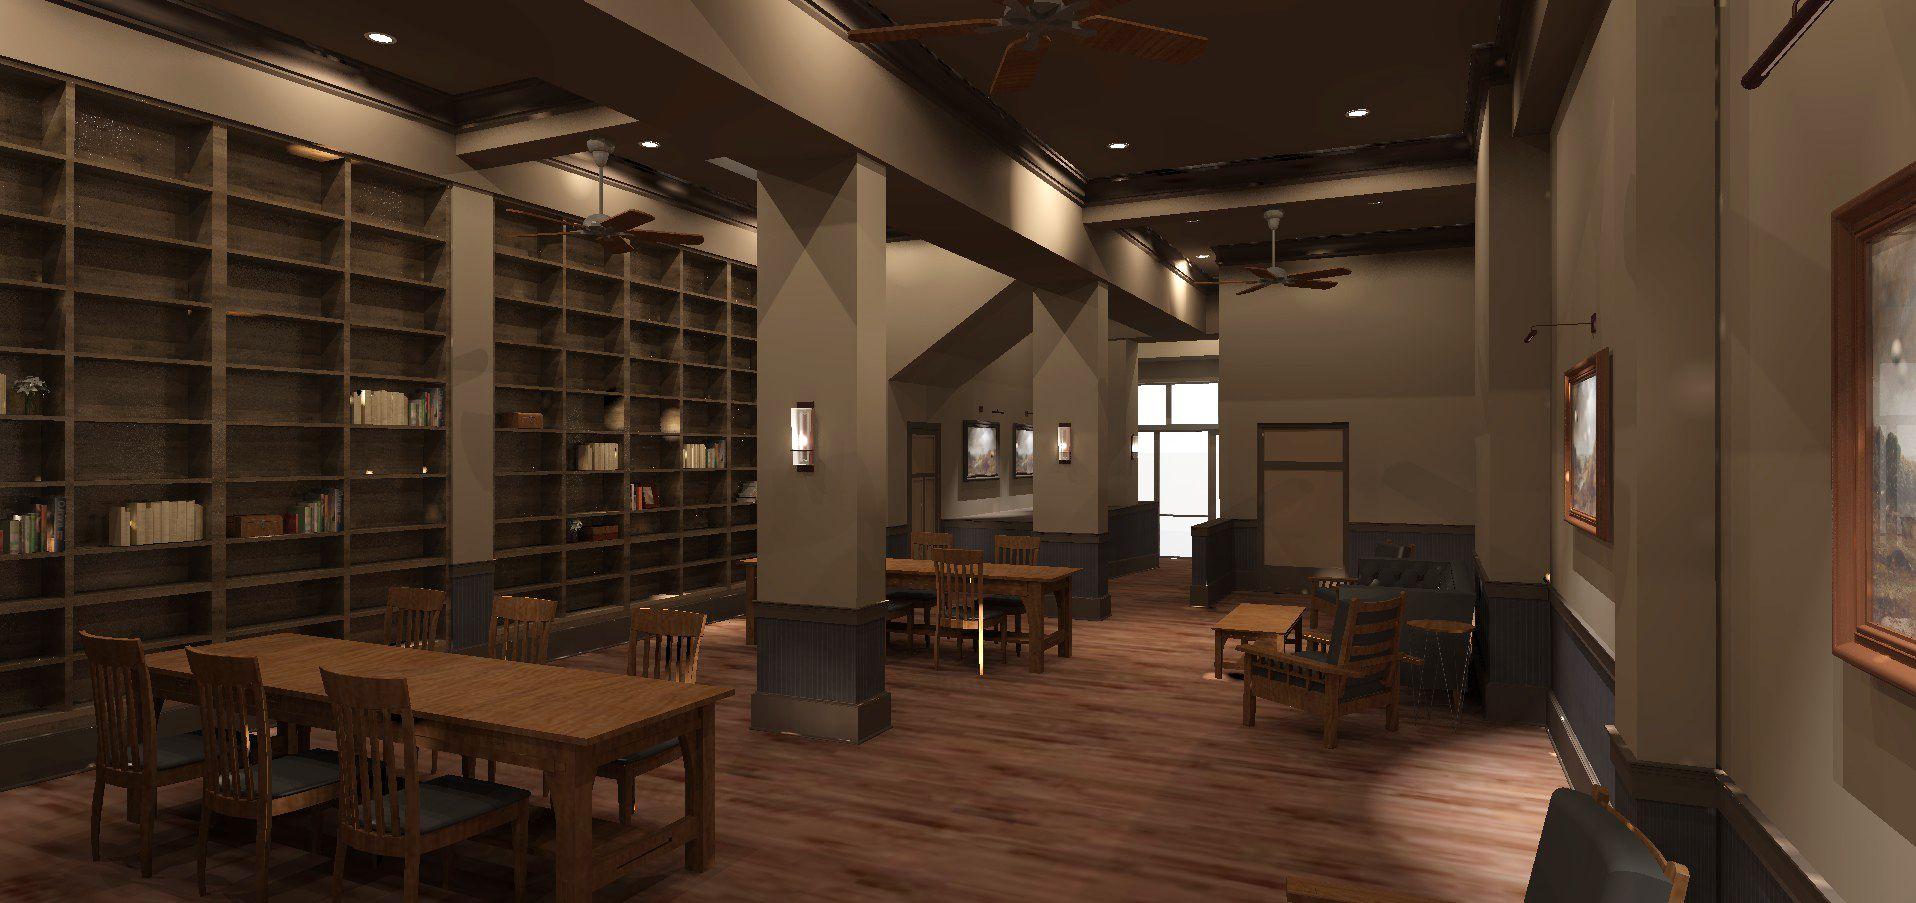 Belvue-lobby-image-4